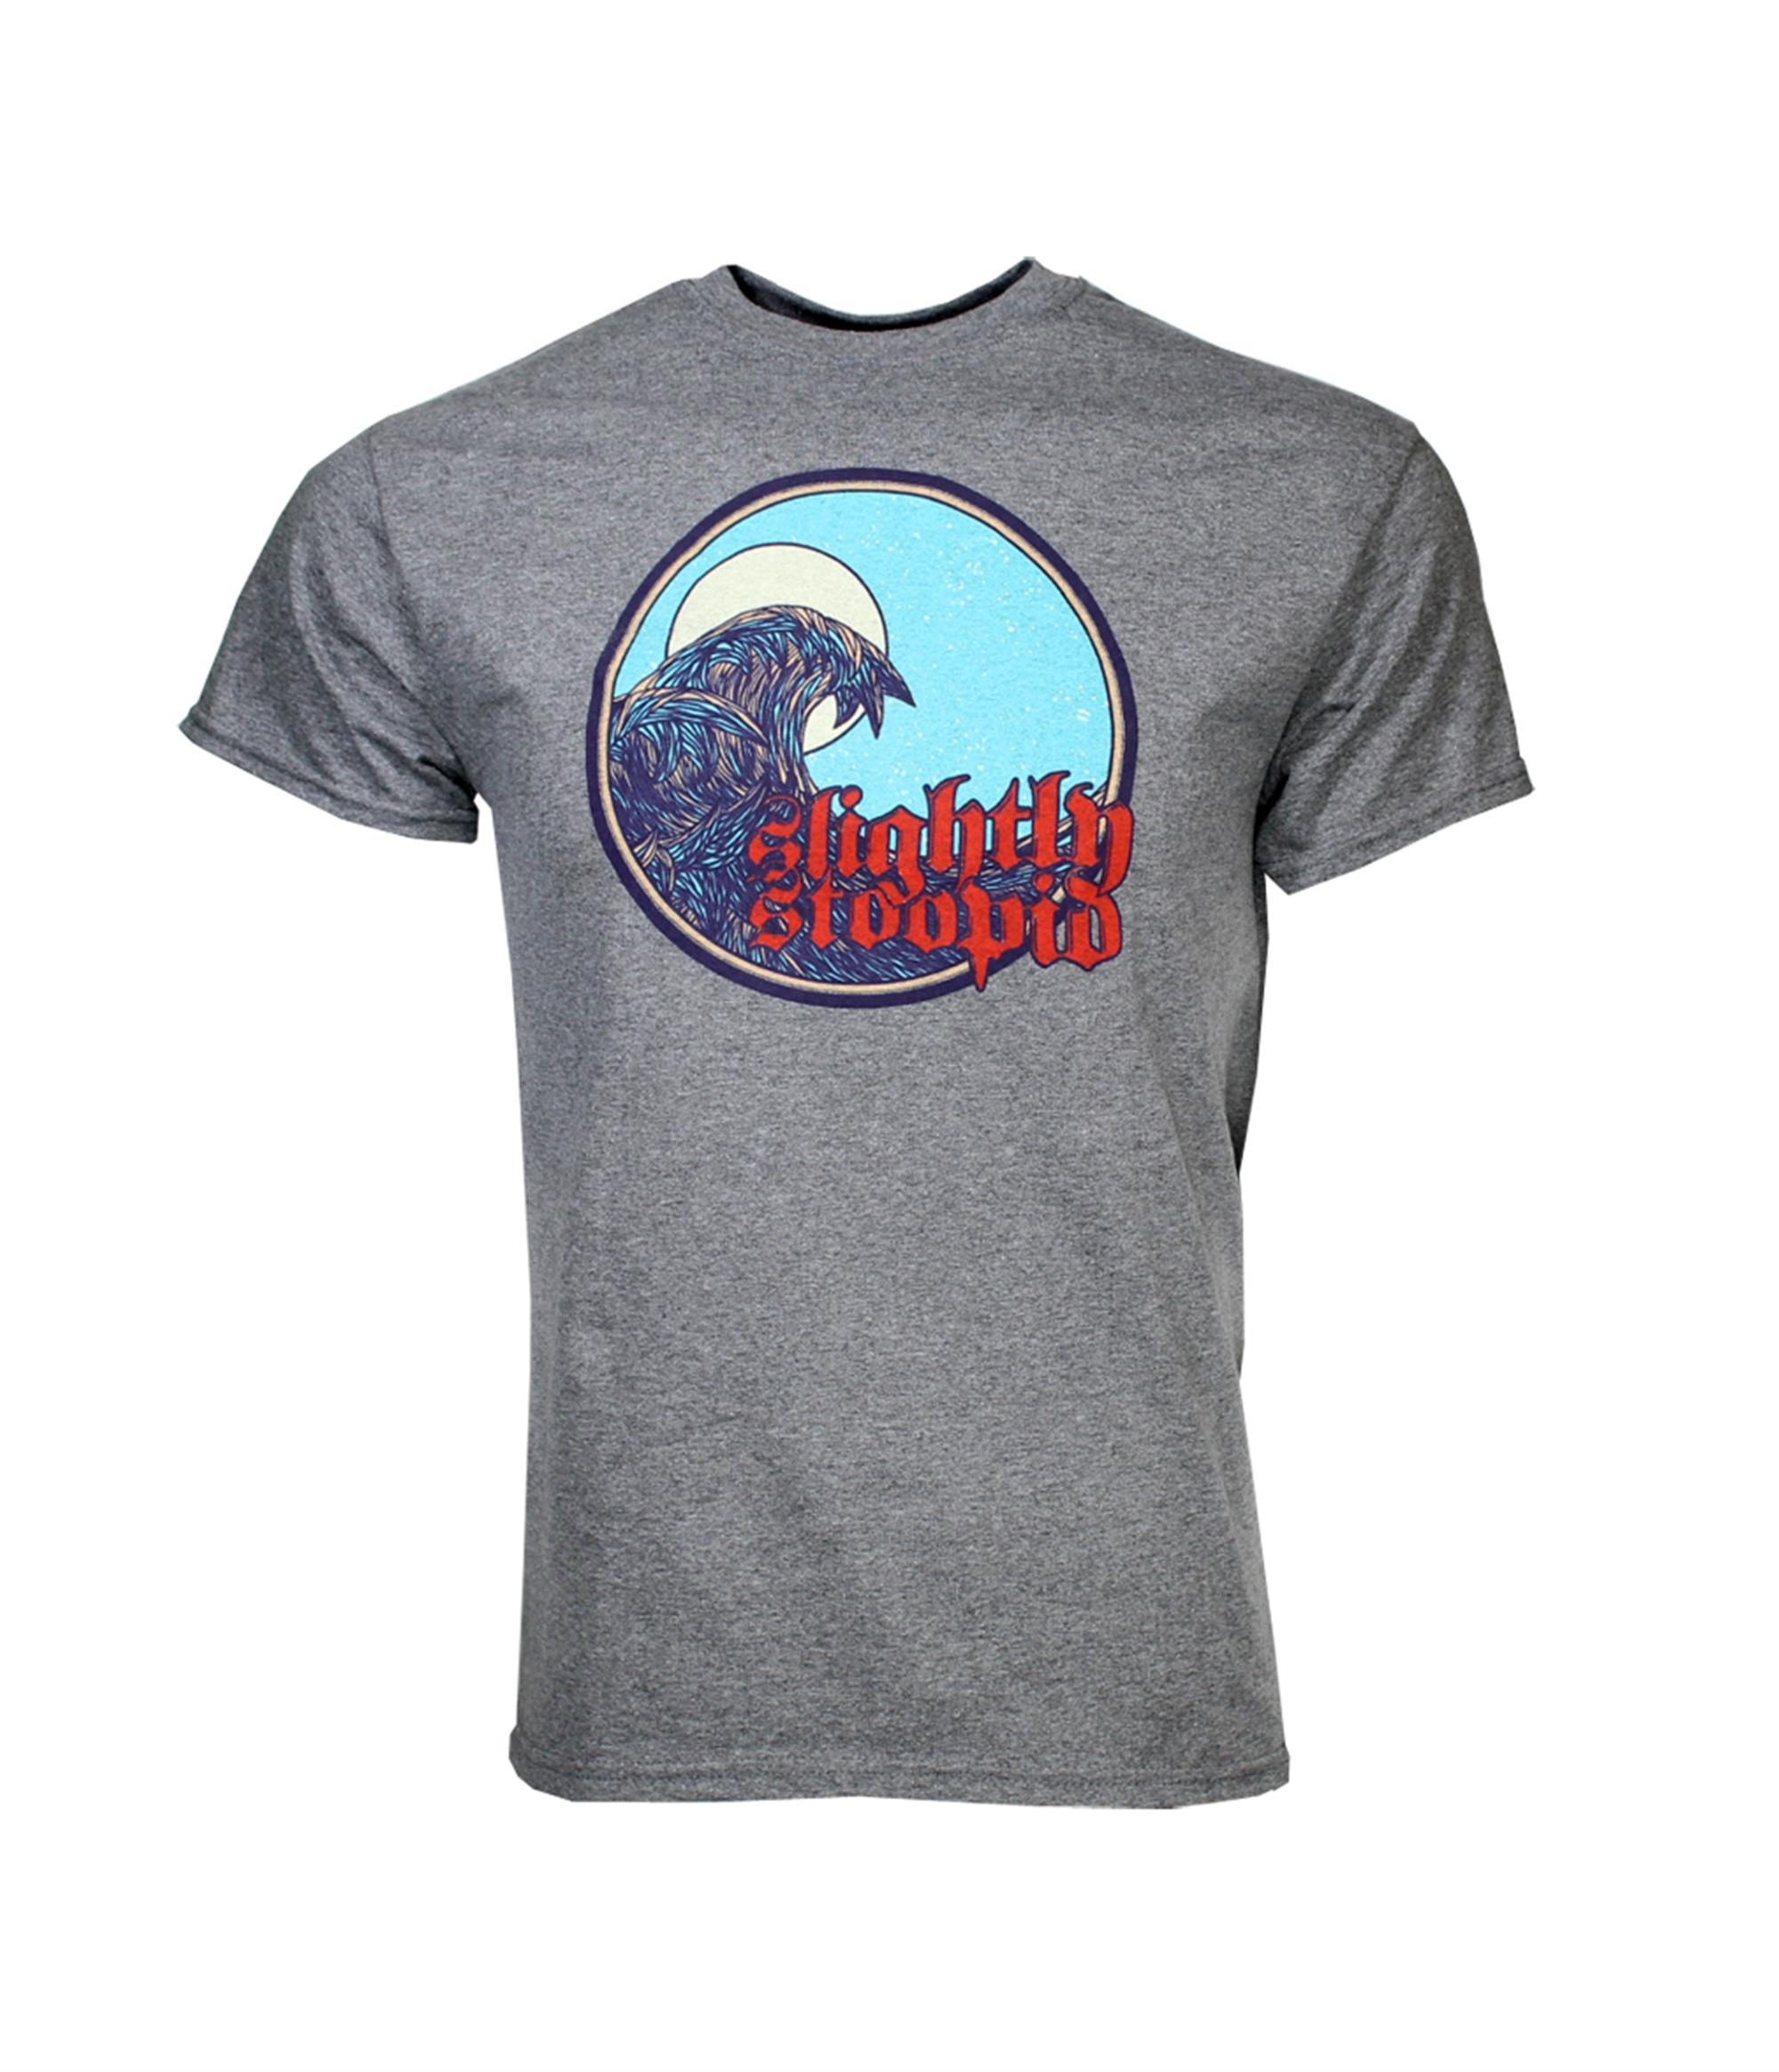 Slightly Stoopid Wave Crest T-Shirt